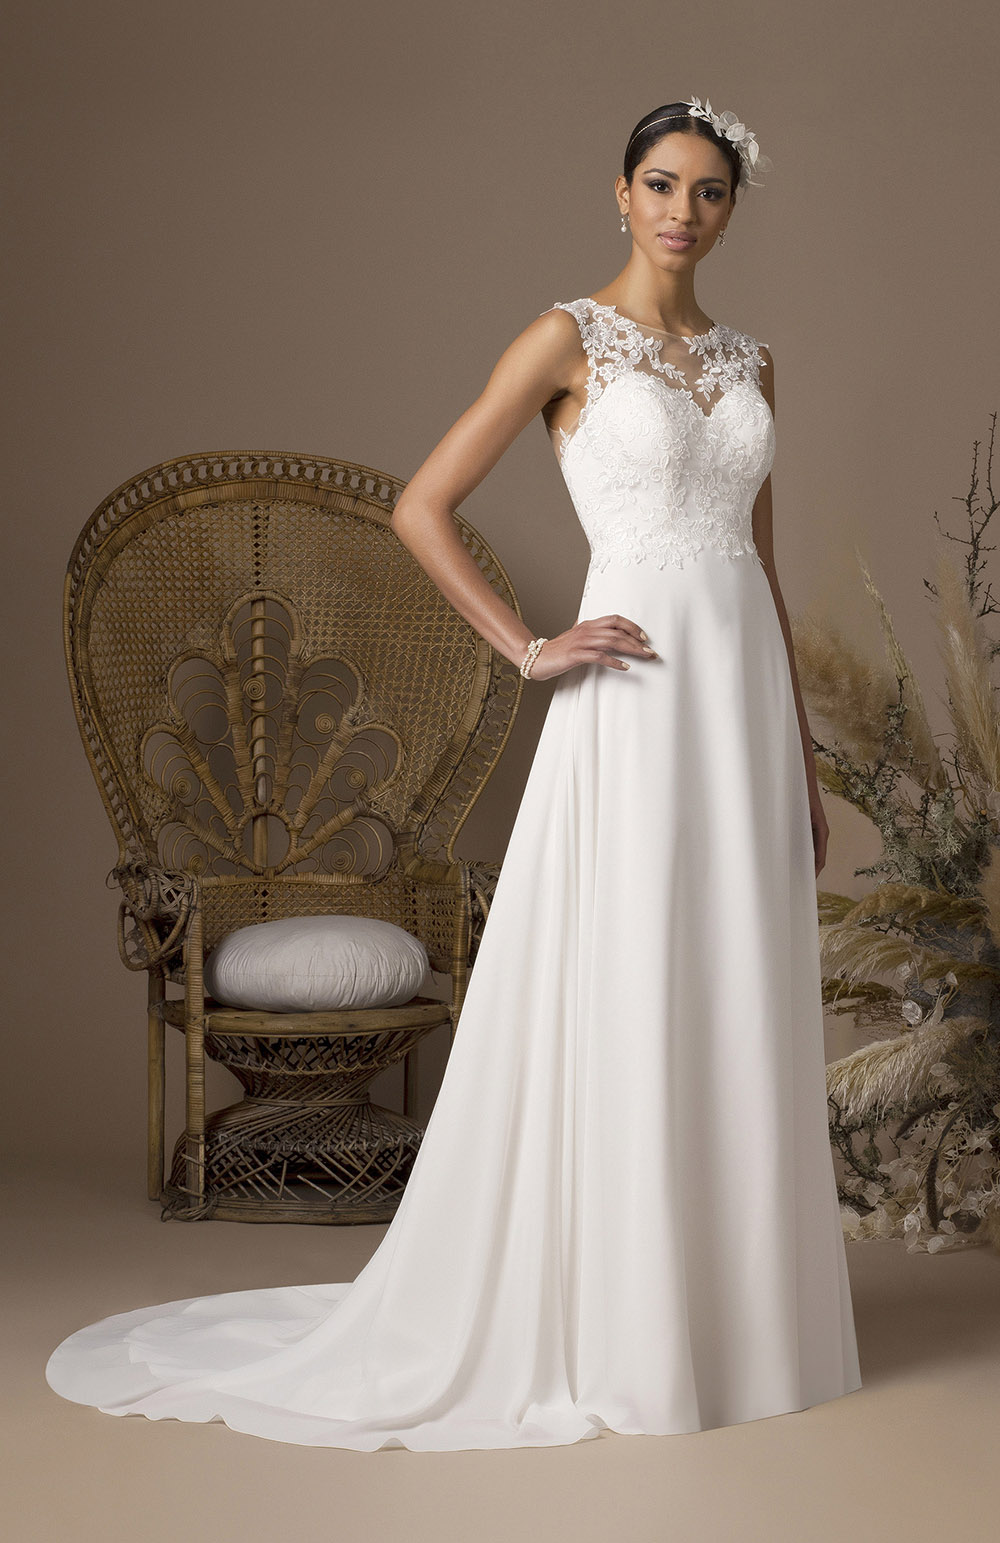 Robe de mariée Modèle Danie